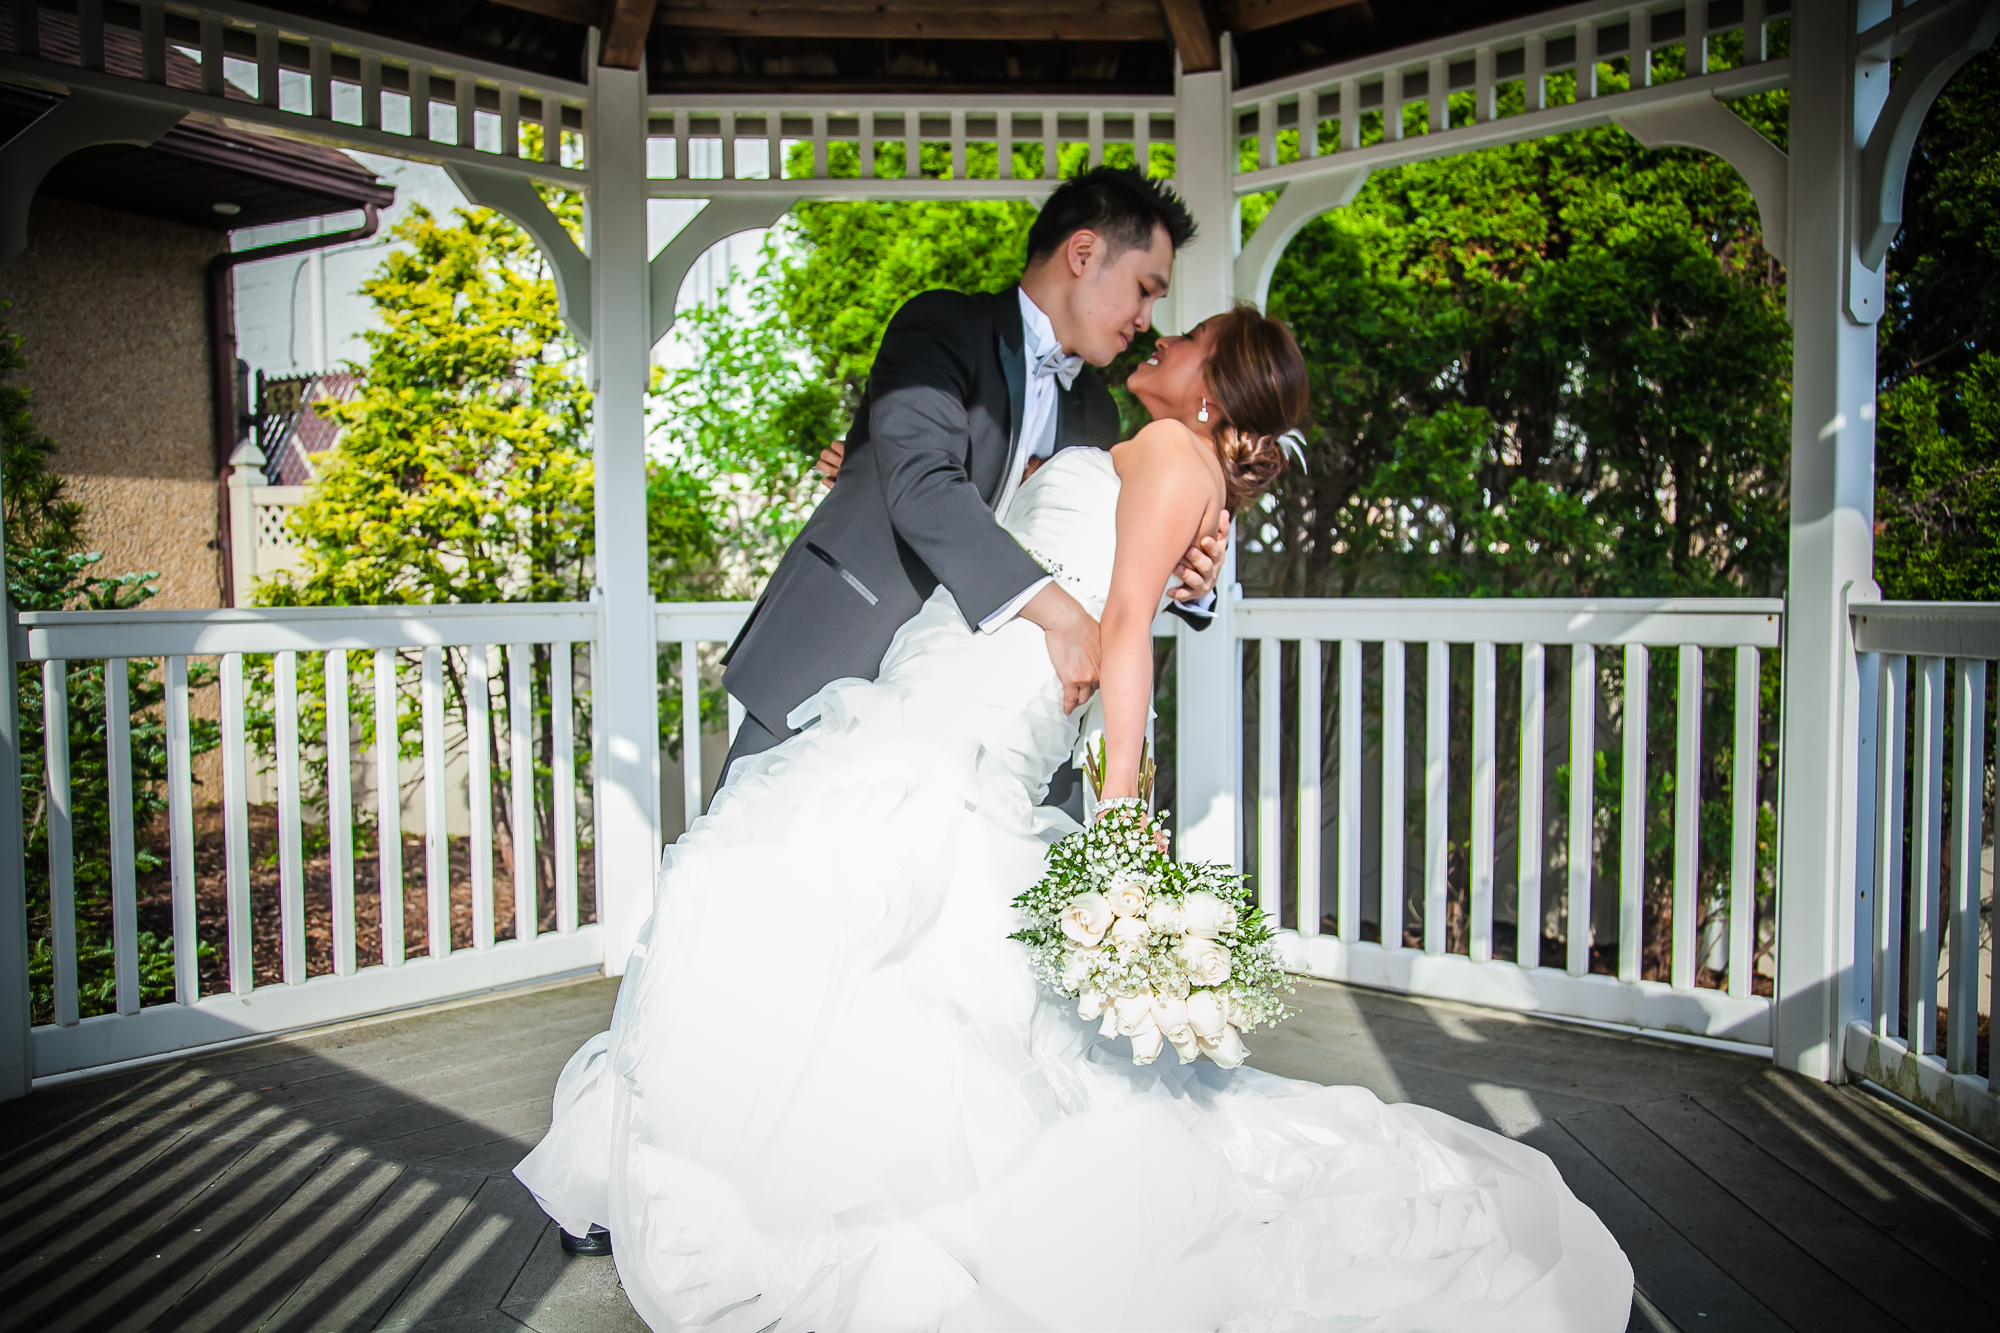 Joanna & Edmond Wedding  Jersey City, NJ.